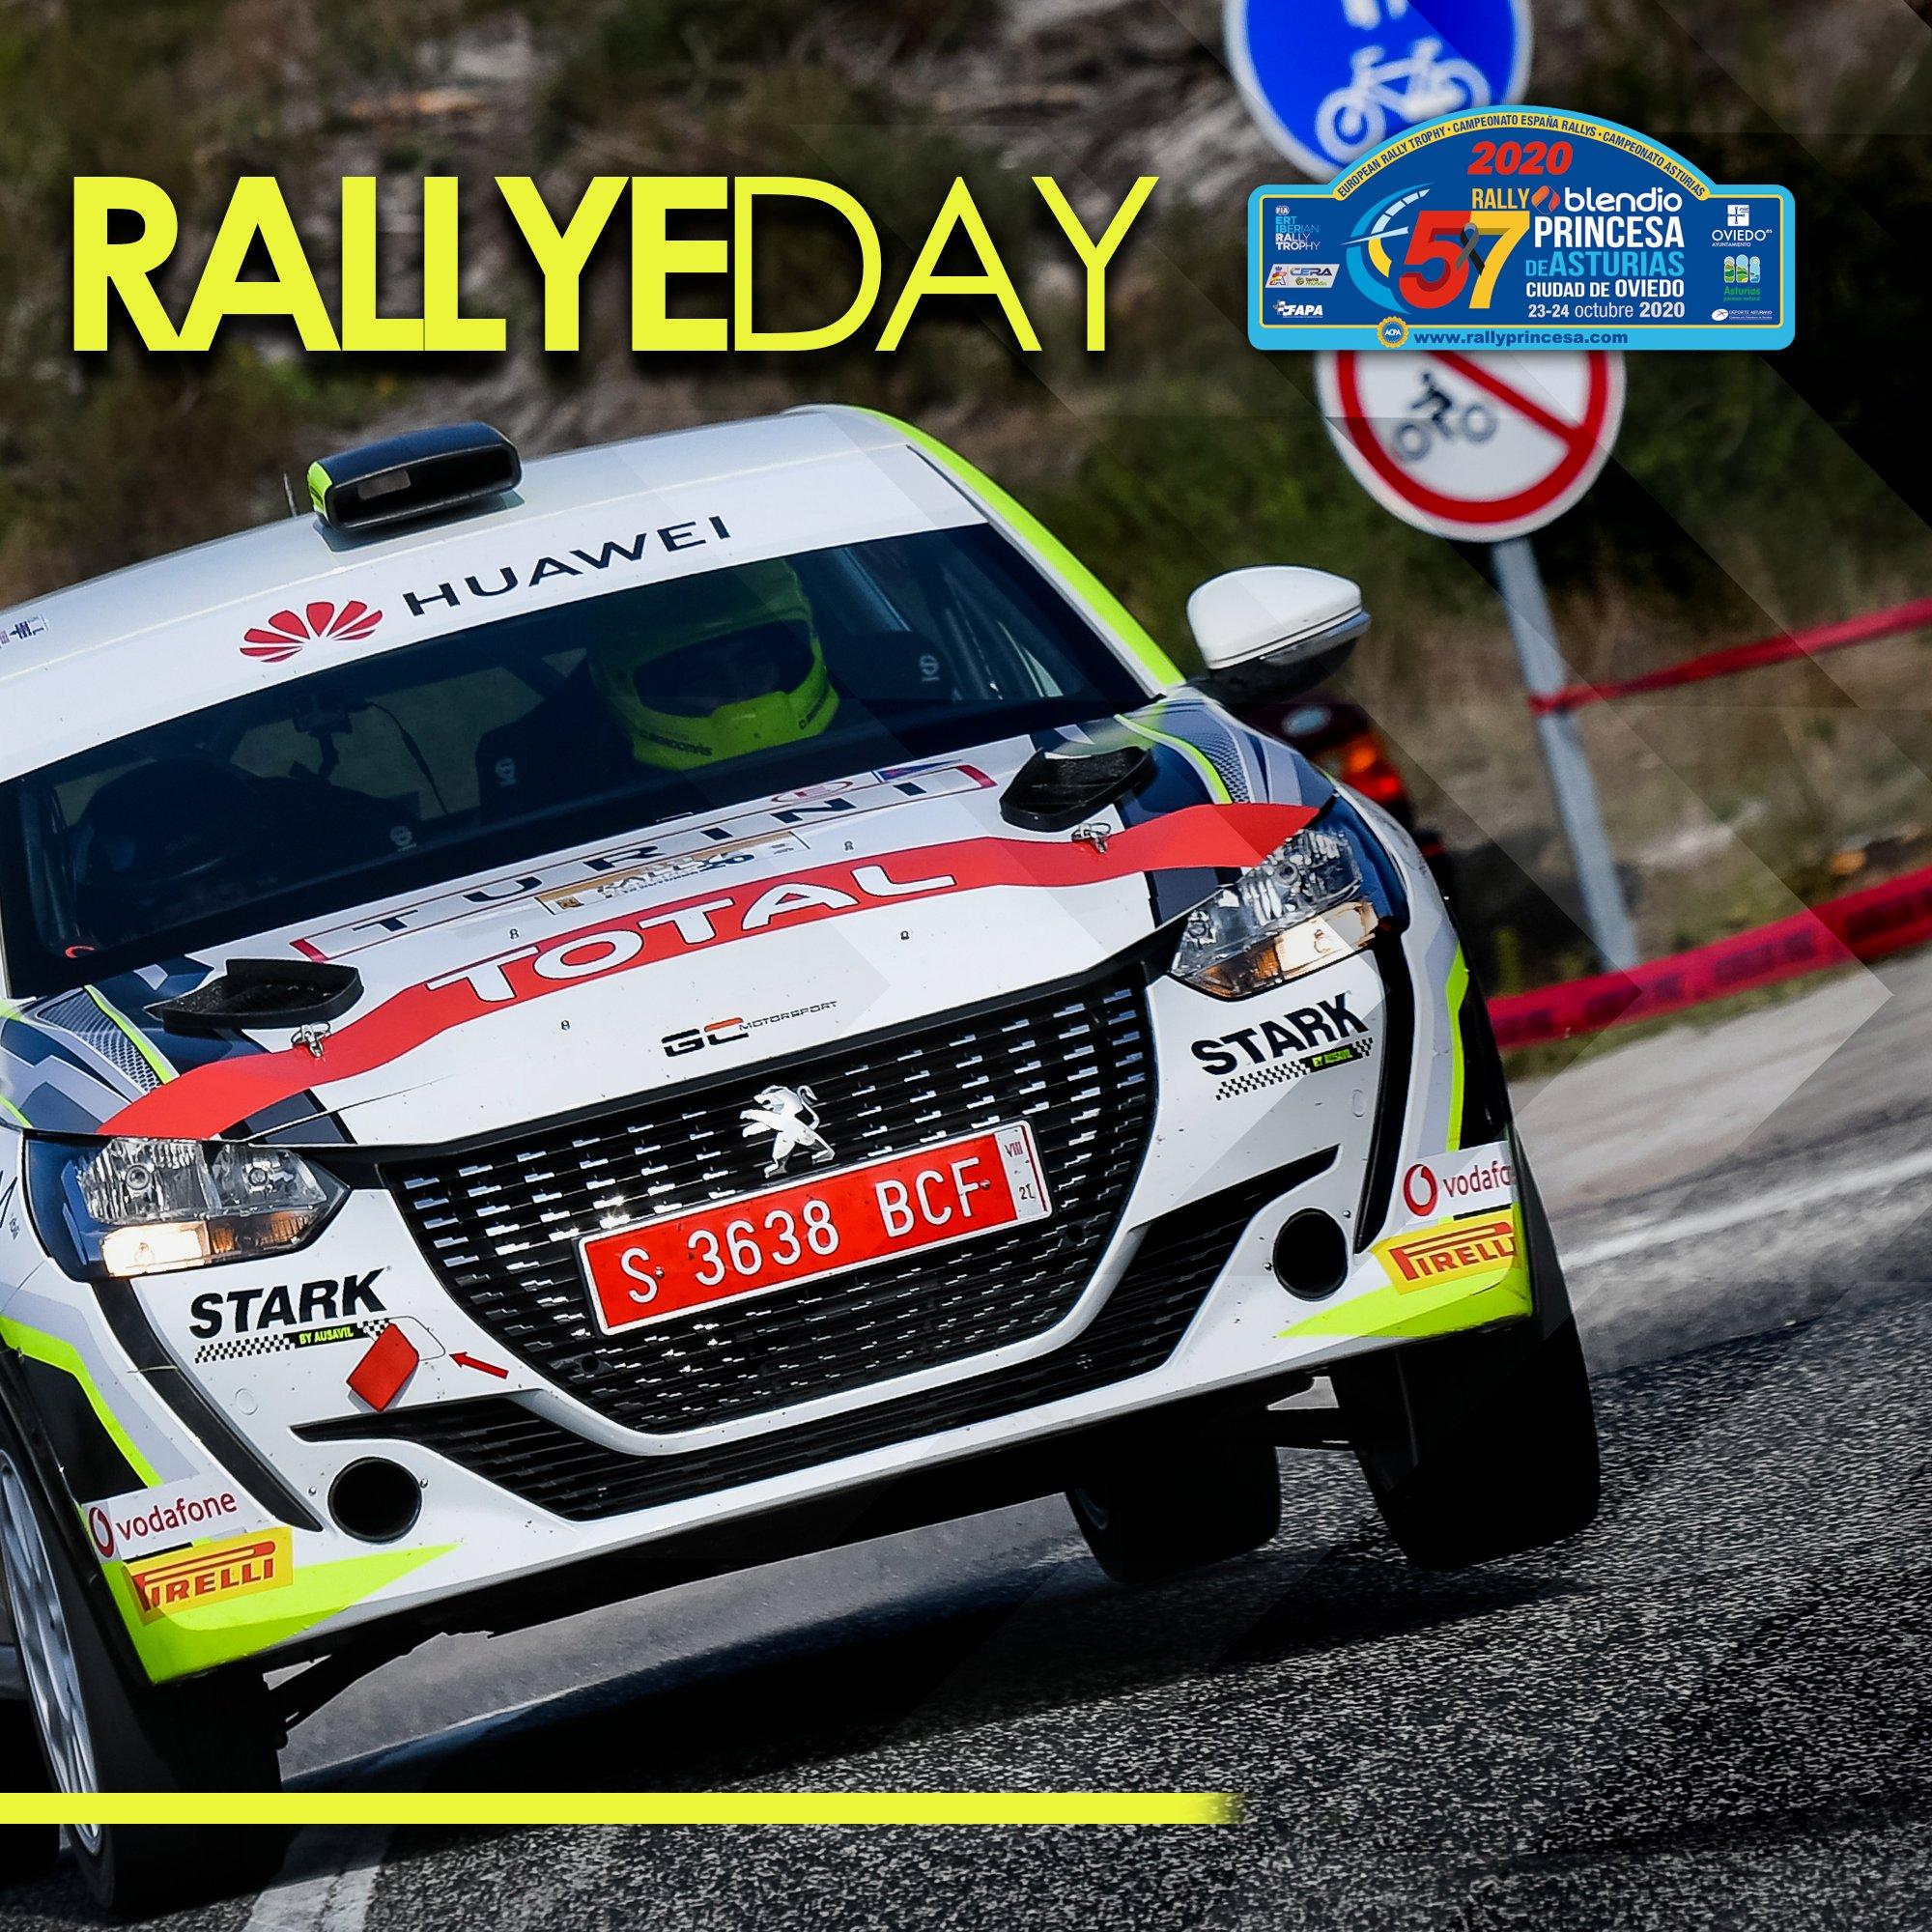 CERA + ERT: 57º Rallye Princesa de Asturias - Ciudad de Oviedo [23-24 Octubre] Ek_kv85WMAA8mMo?format=jpg&name=large